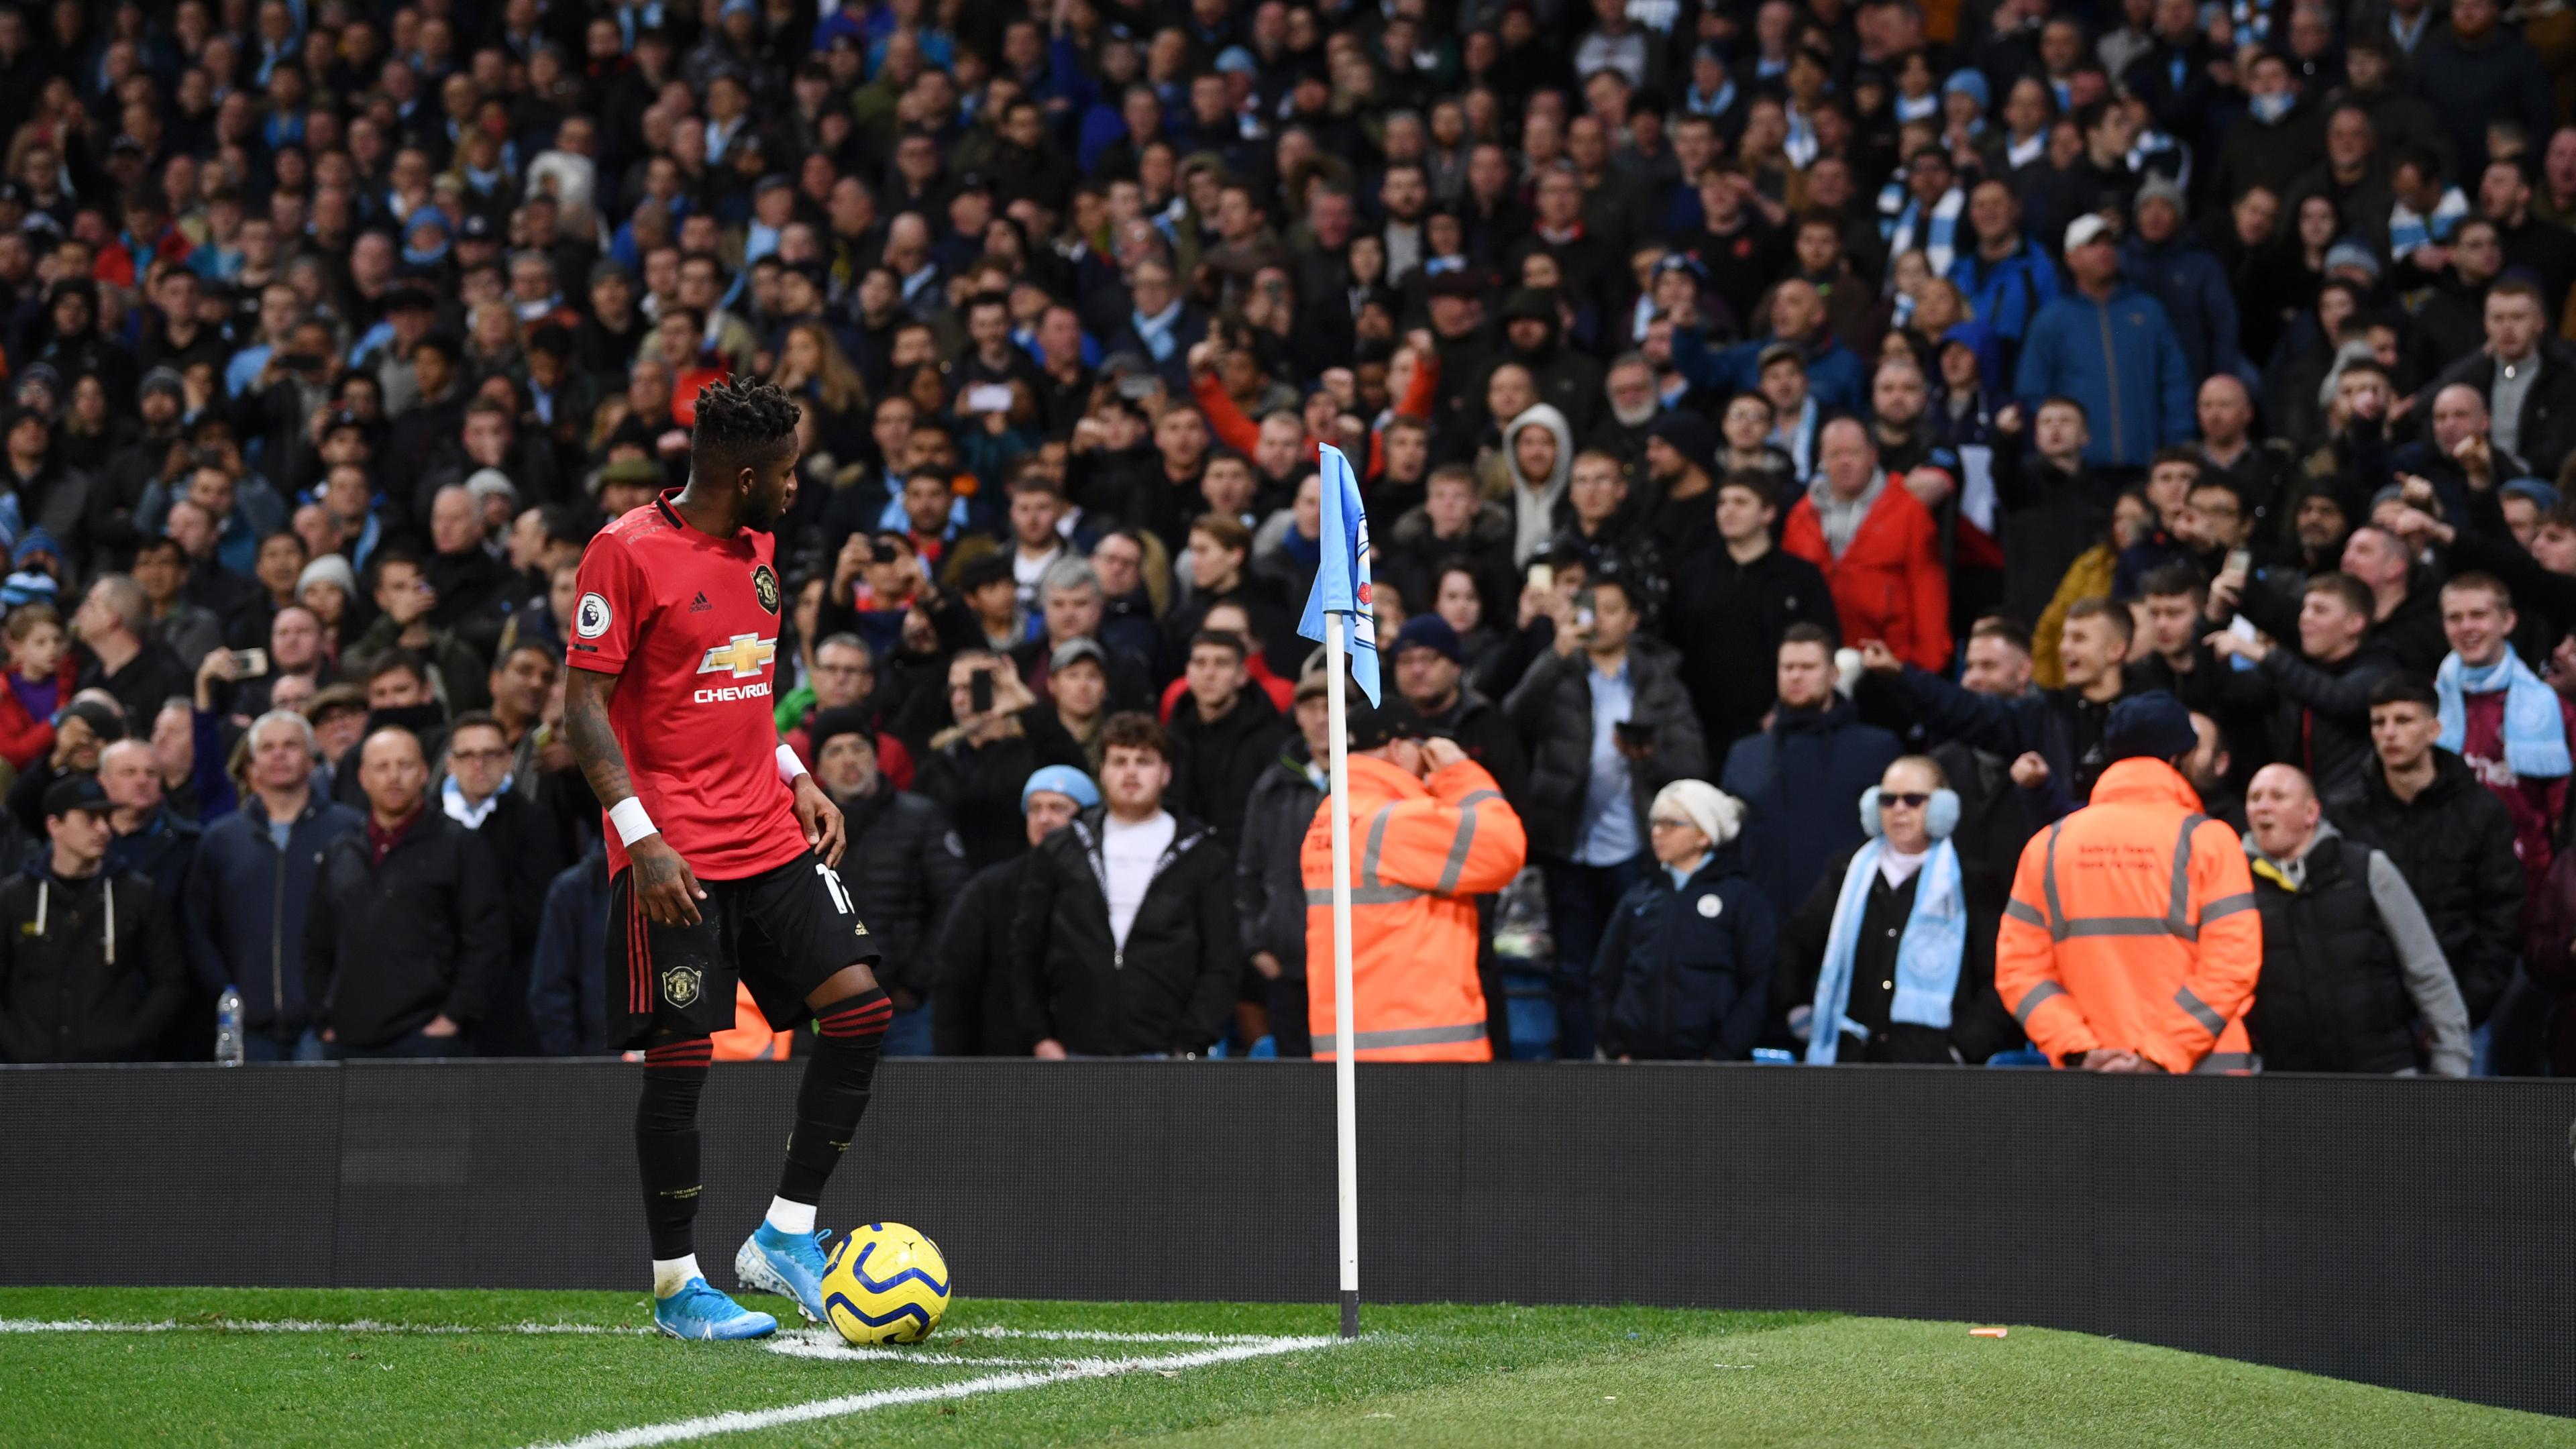 gambar 2 - fred manchester united korban rasisme